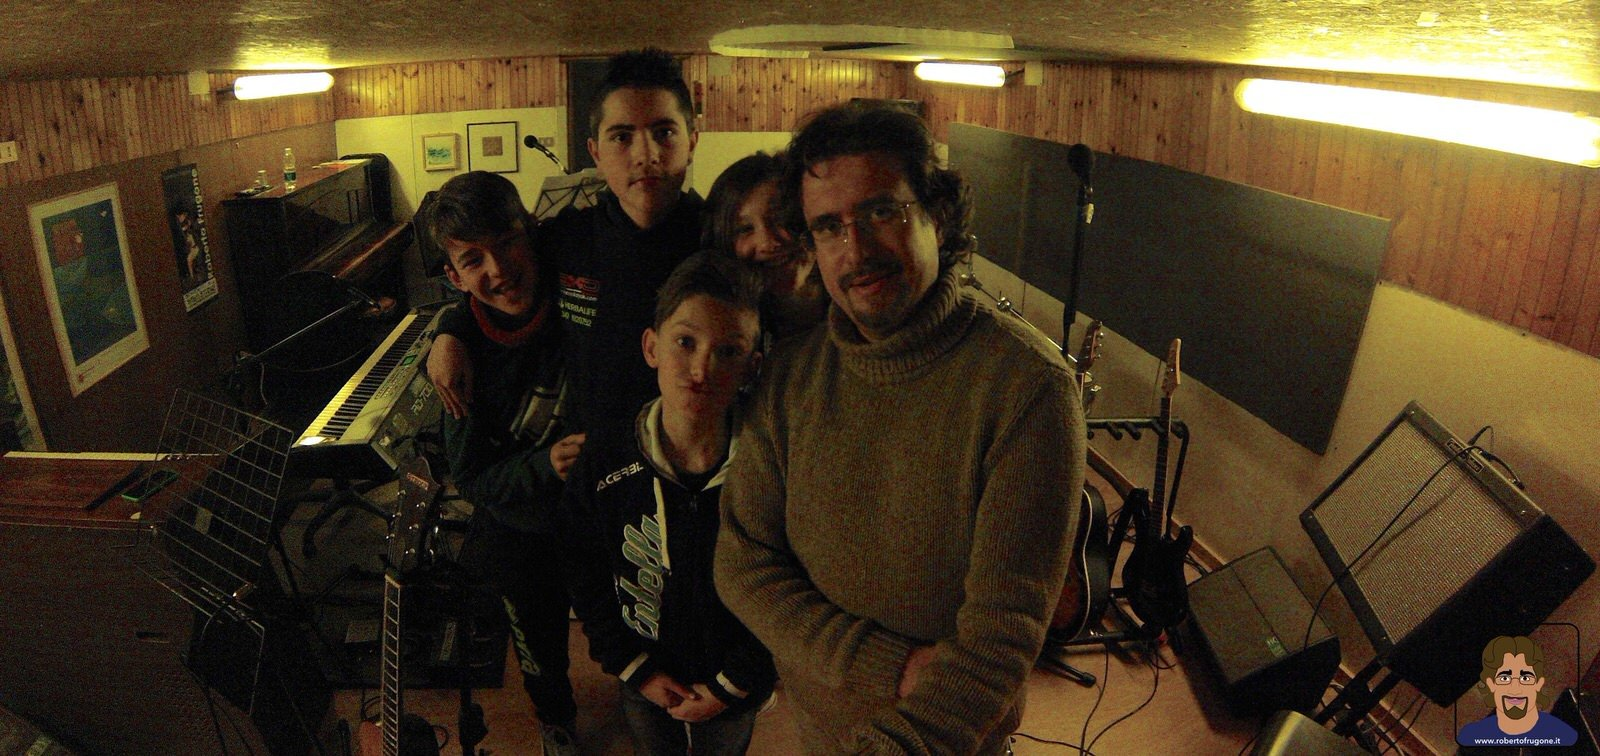 Totem Studio Sala Prove Musicali Casarza Ligure Laboratorio Musica d'Insieme 03